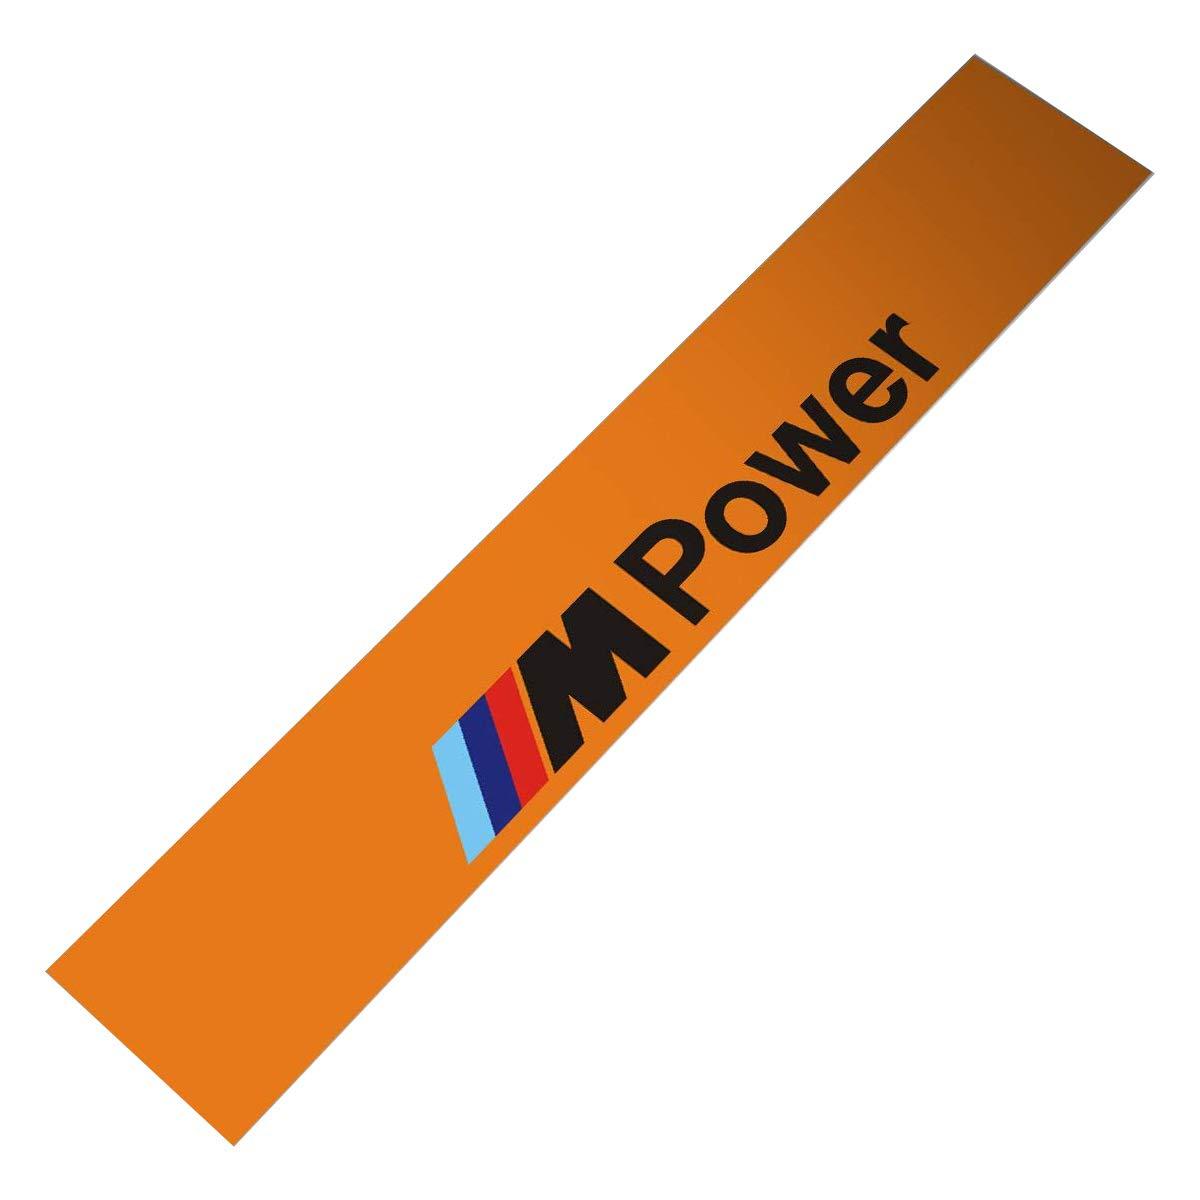 Demupai Front Windshield Banner Decal Vinyl Car Stickers for BMW M Power Accessories 51.97 X 8.27 Orange Background